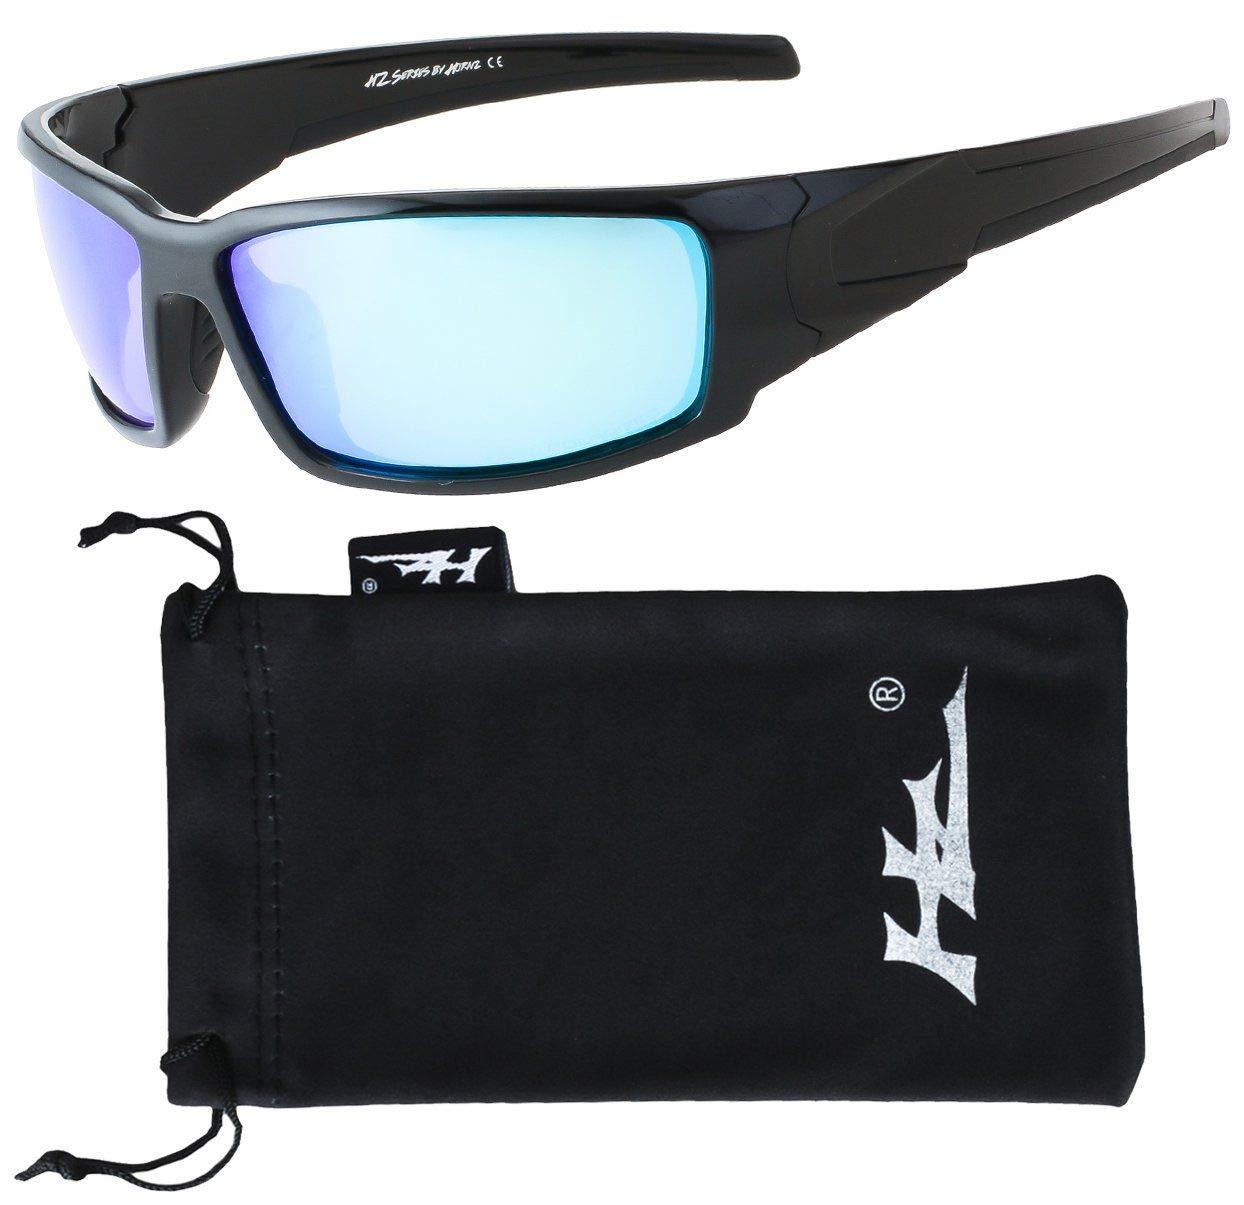 Polarized Sunglasses for Men - Premium Sport Sunglasses - HZ Series Aquabull by Hornz (Image #1)